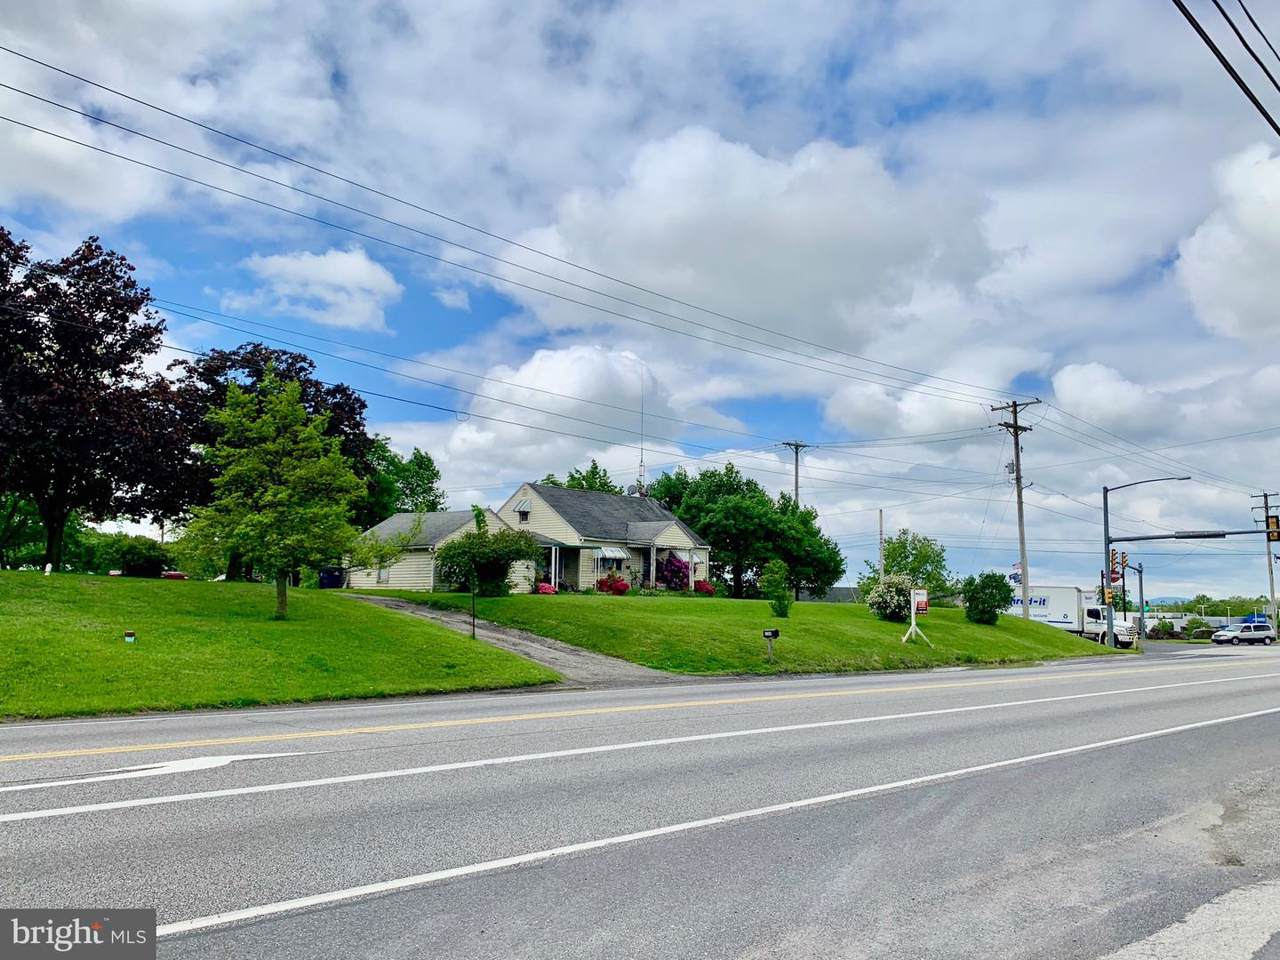 1709 & 1721 ~ 16 & 2 York Road, Cavalry Field Road - Photo 1